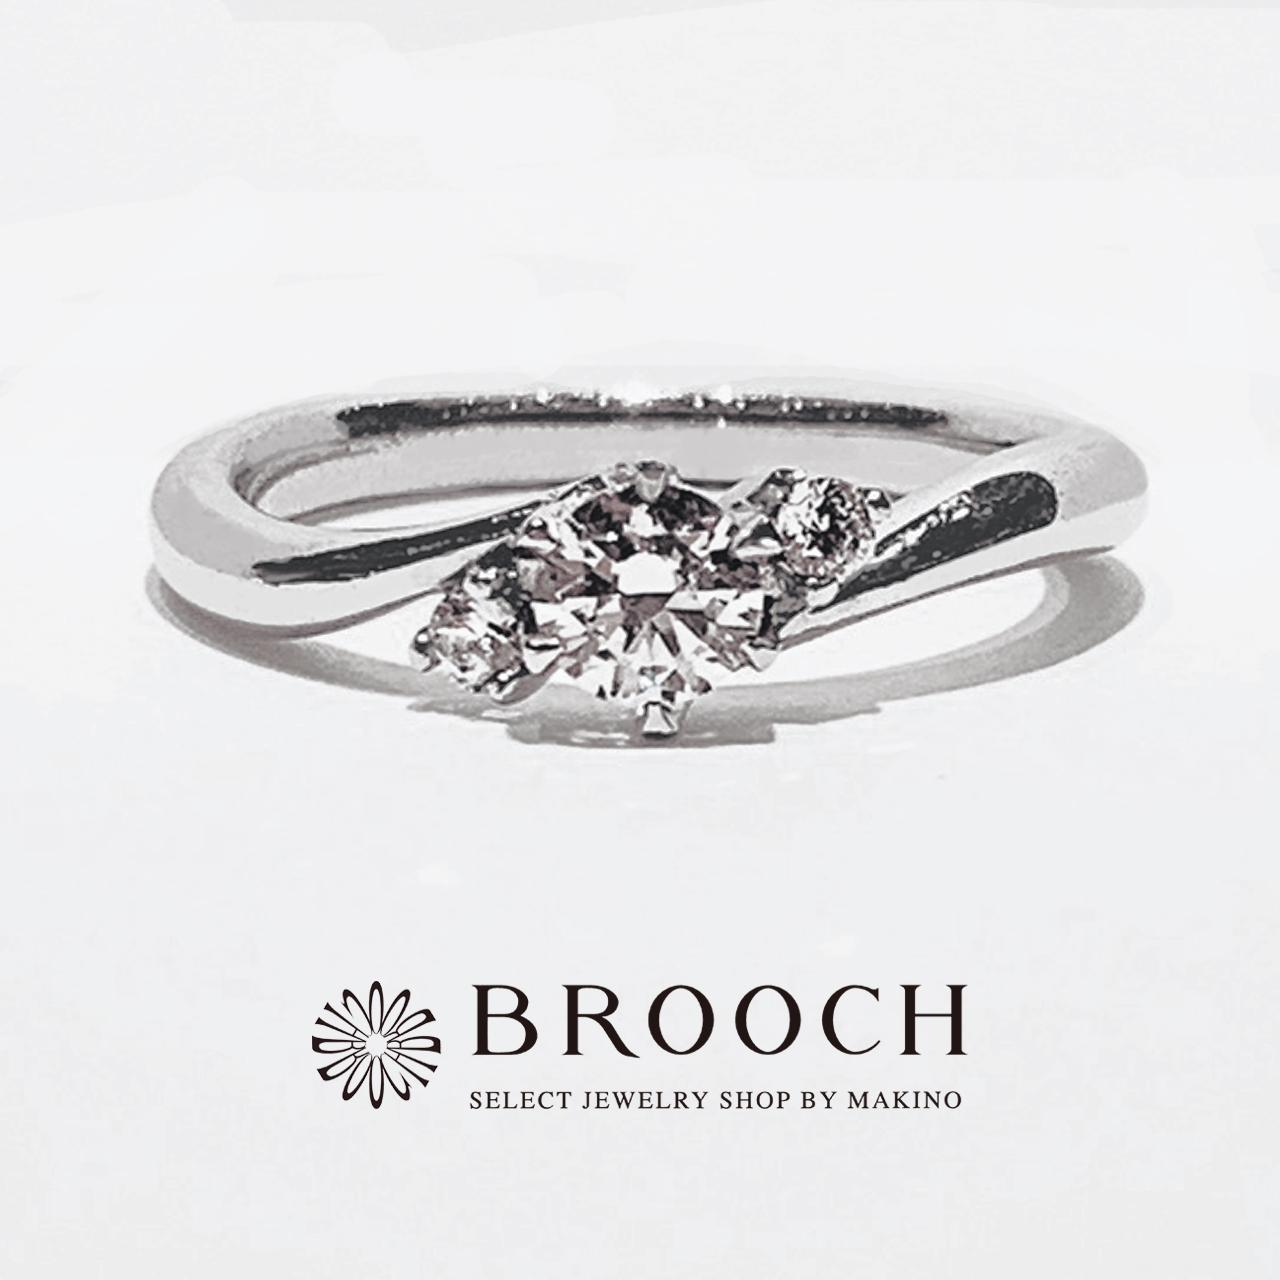 BROOCH 婚約指輪 エンゲージリング シンプルウェーブデザイン両サイドメレ